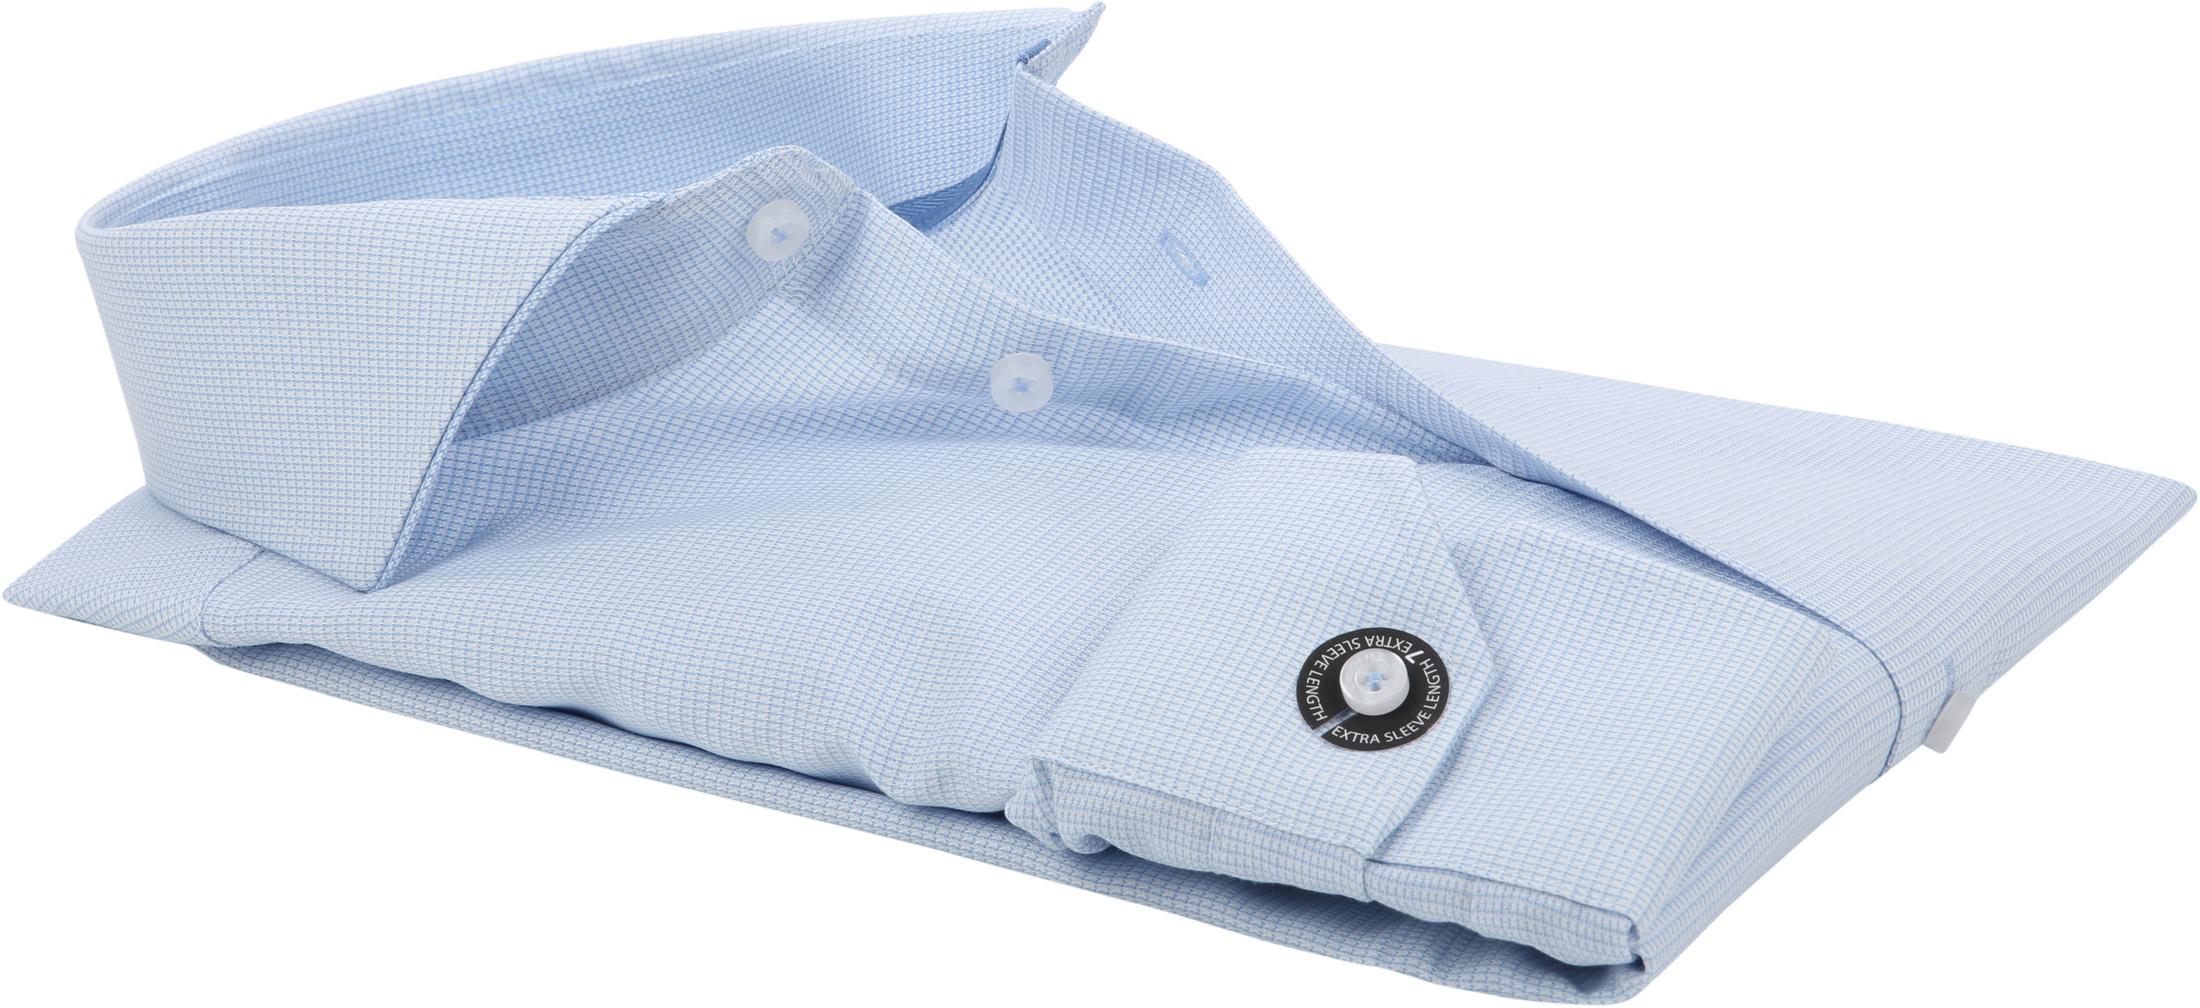 Ledub Overhemd Blauw Non Iron SL7 foto 3